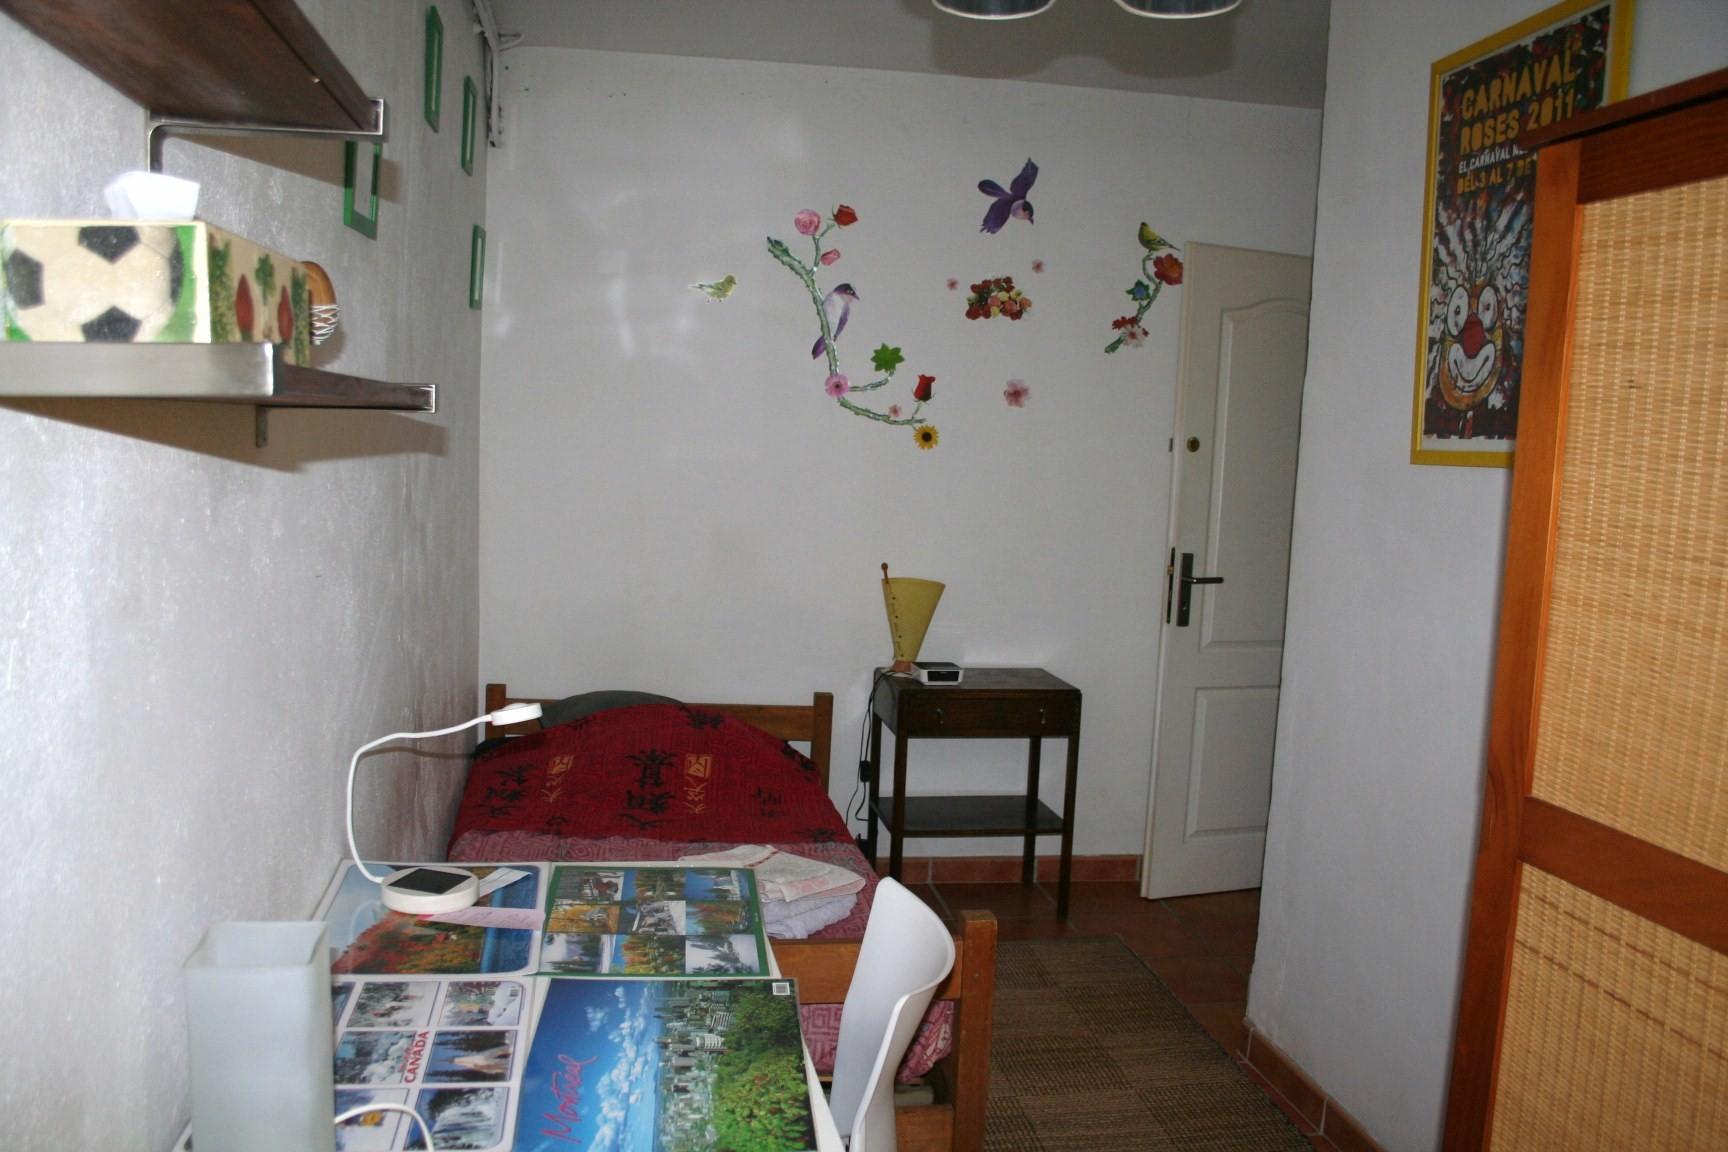 chambre-meublee-independante-avec-sdb-cuisine-meublee-quartier-rangueil-pech-david-avec-vu-sur-mon-jardin-fleuri-dee8656e3da200cbc916c4ef4077025e